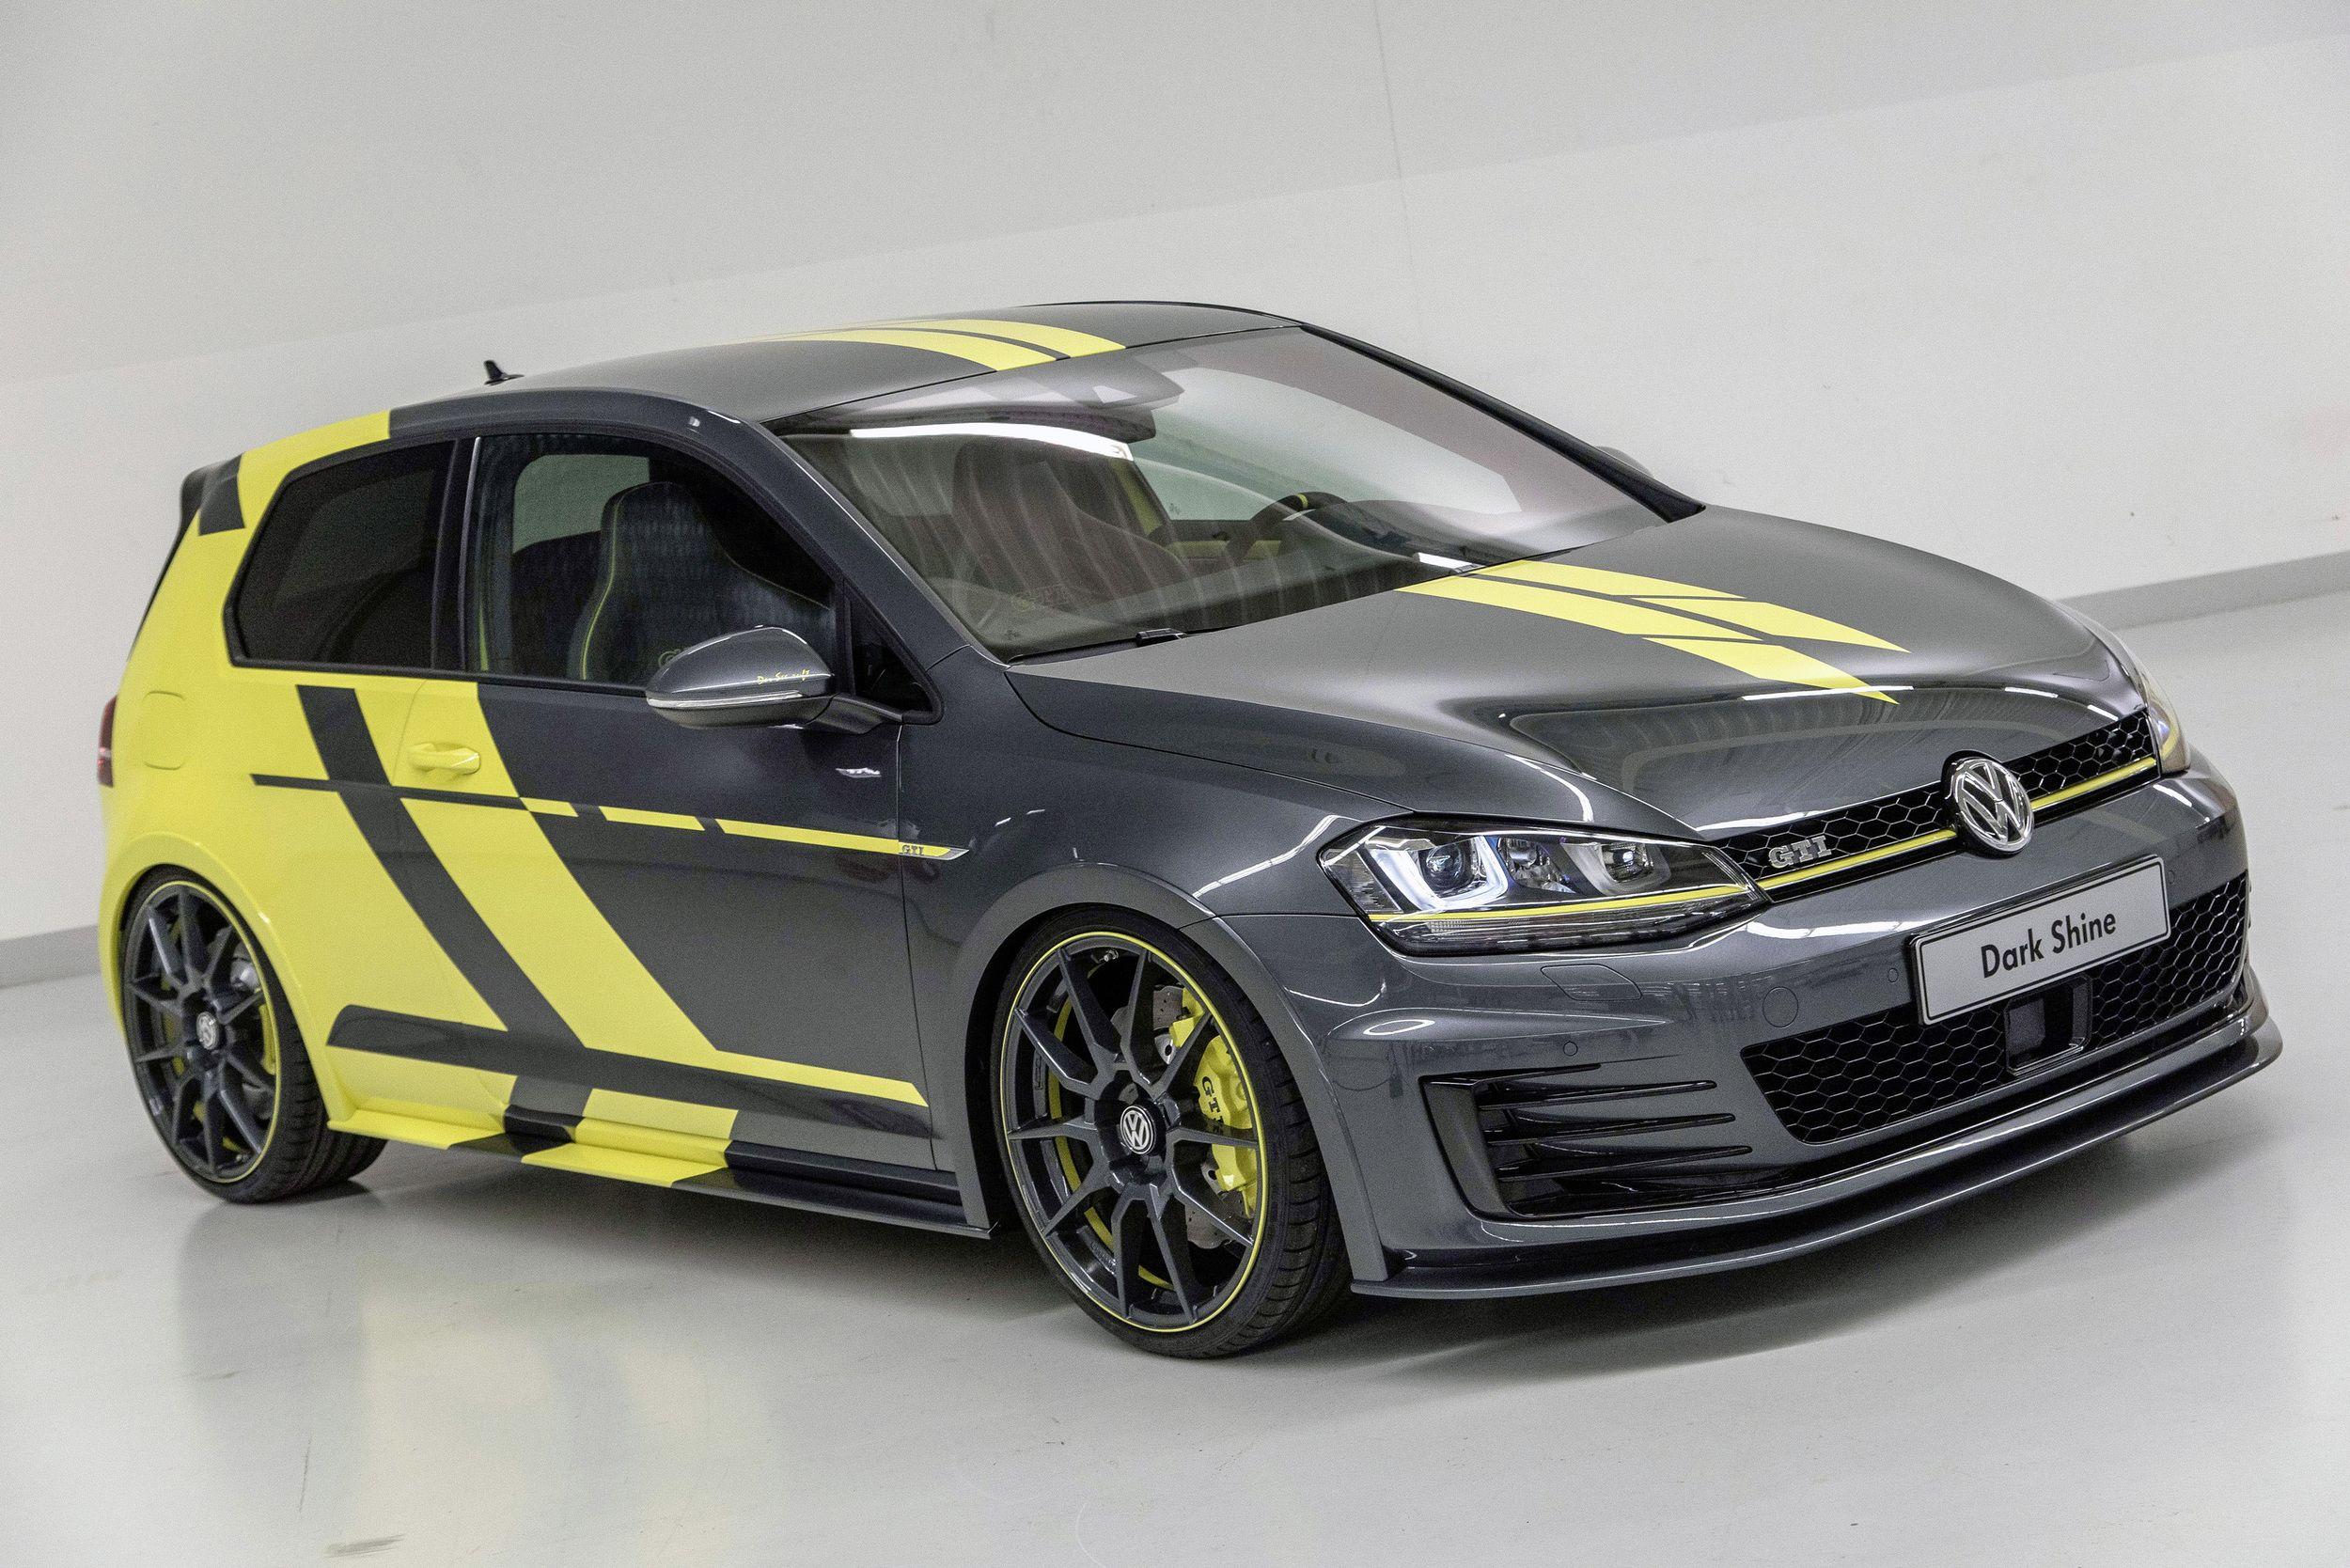 VW Apprentices Prep Golf GTI Dark Shine Variant Biturbo For Worthersee